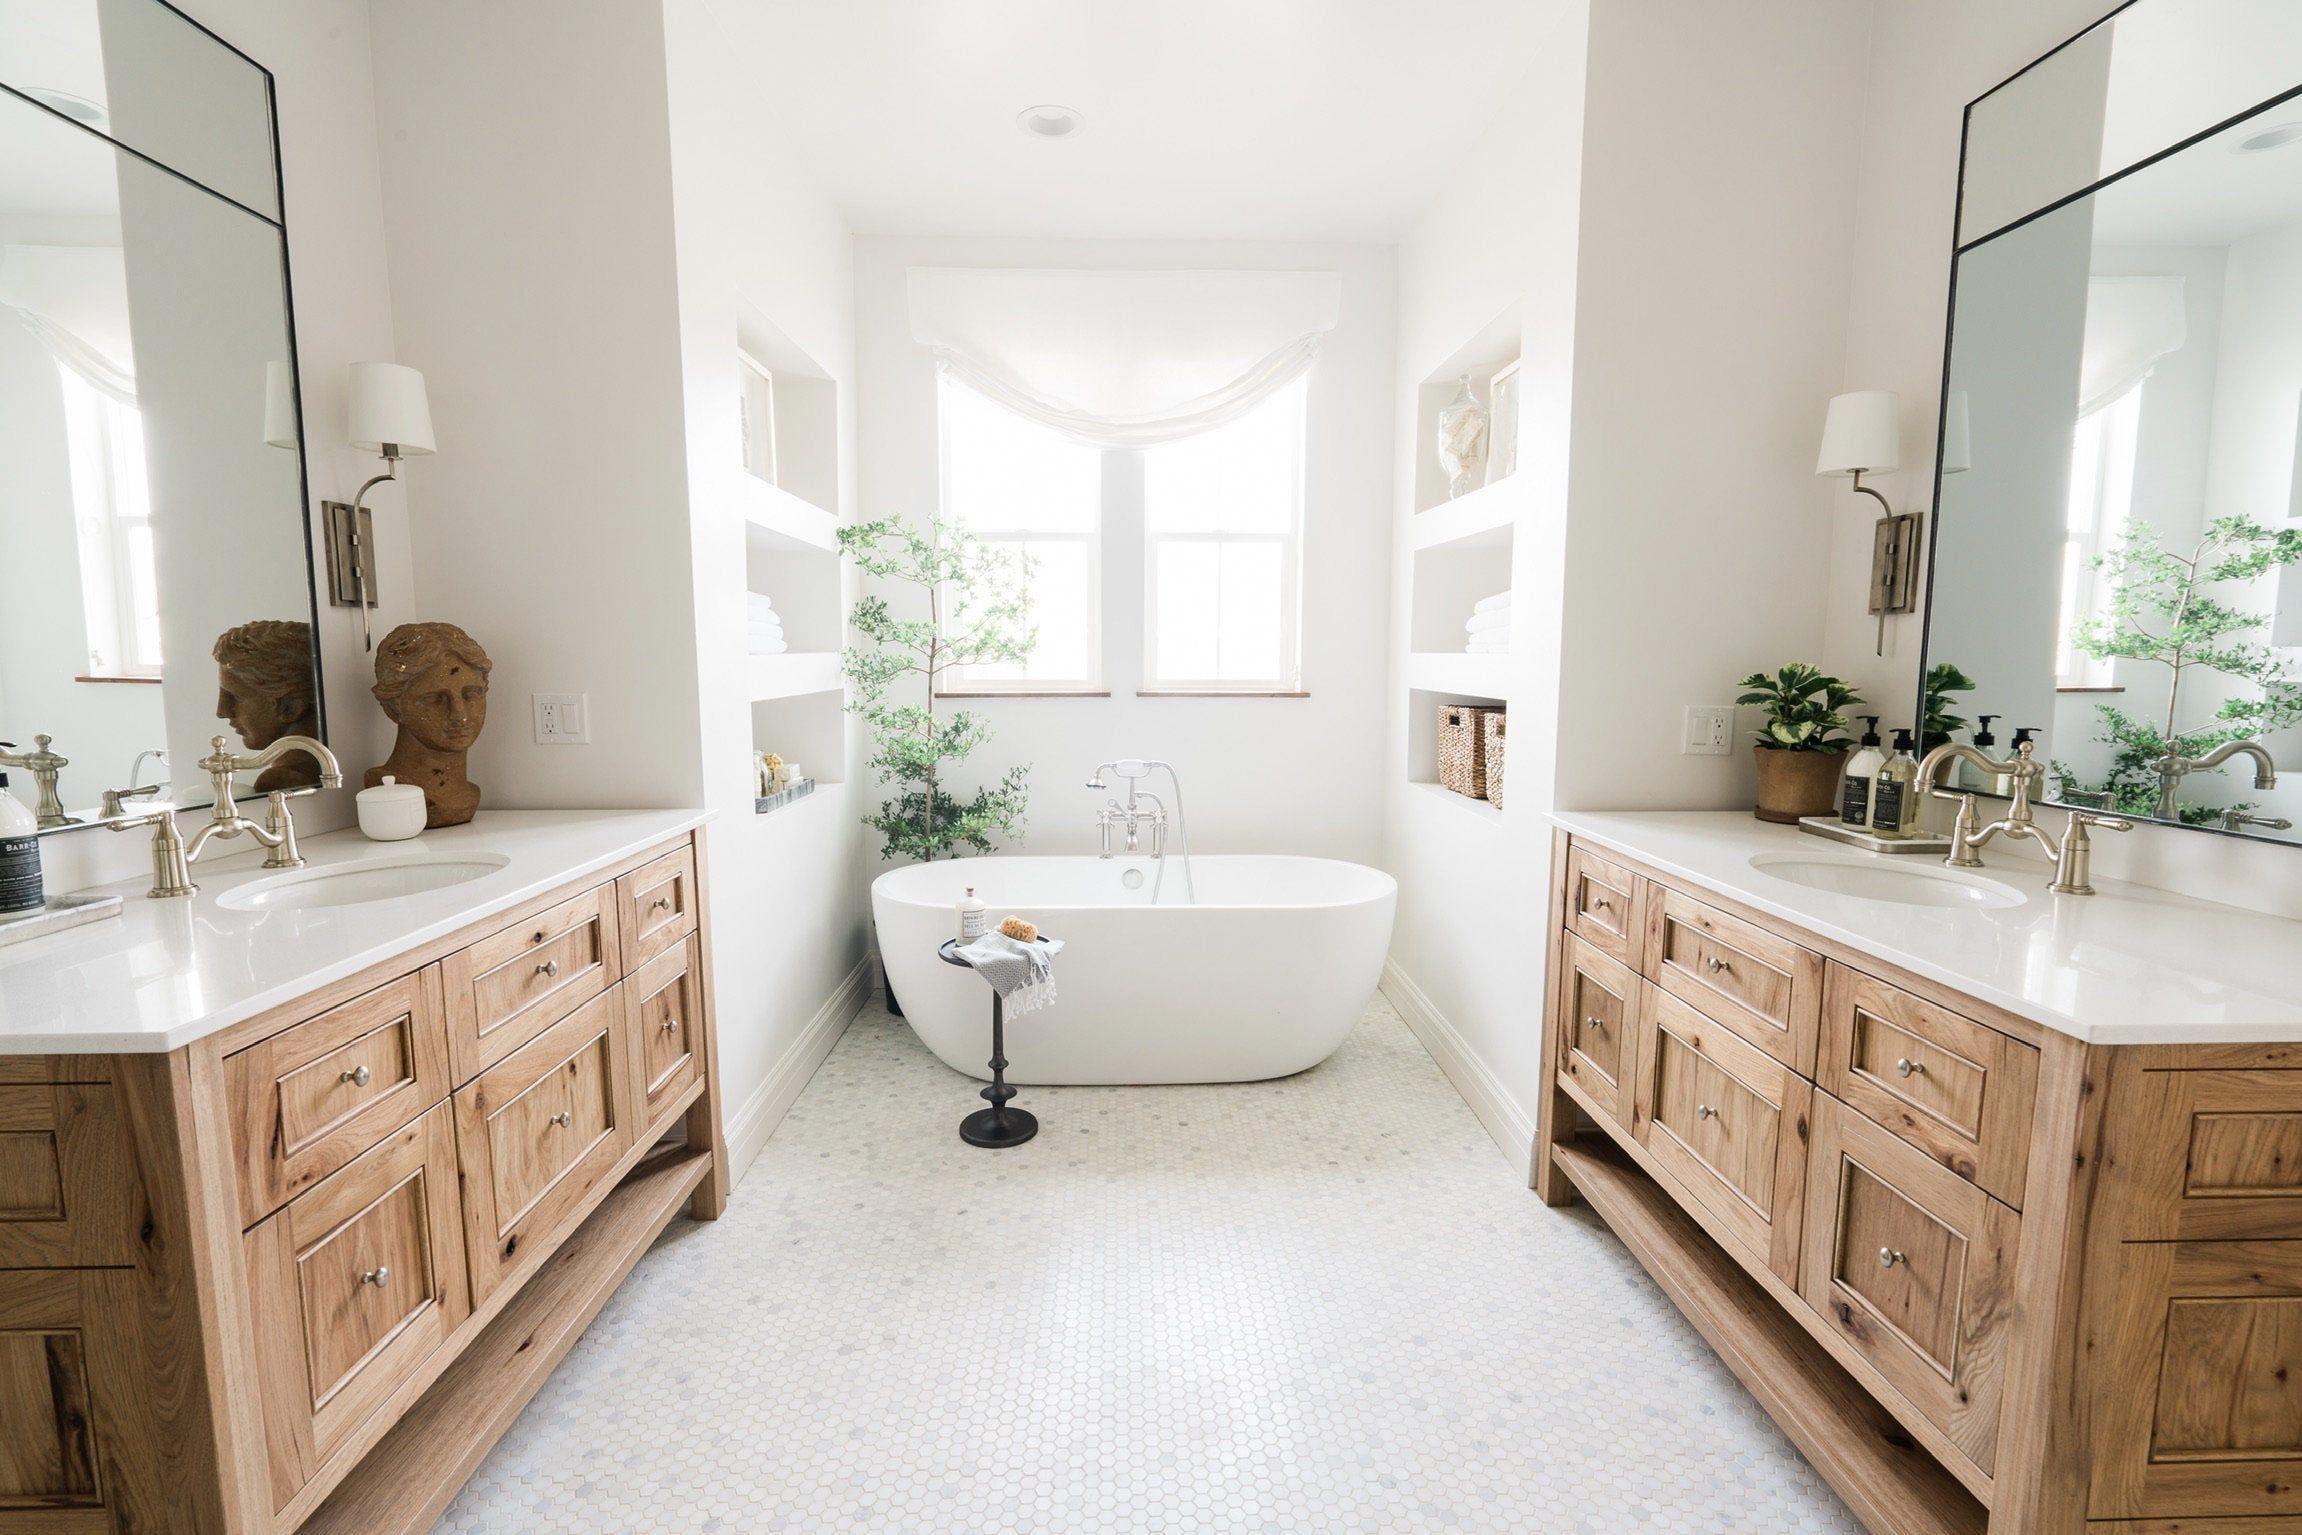 Large Modern Wall Mirror Bathroom Vanity Decorative Industrial